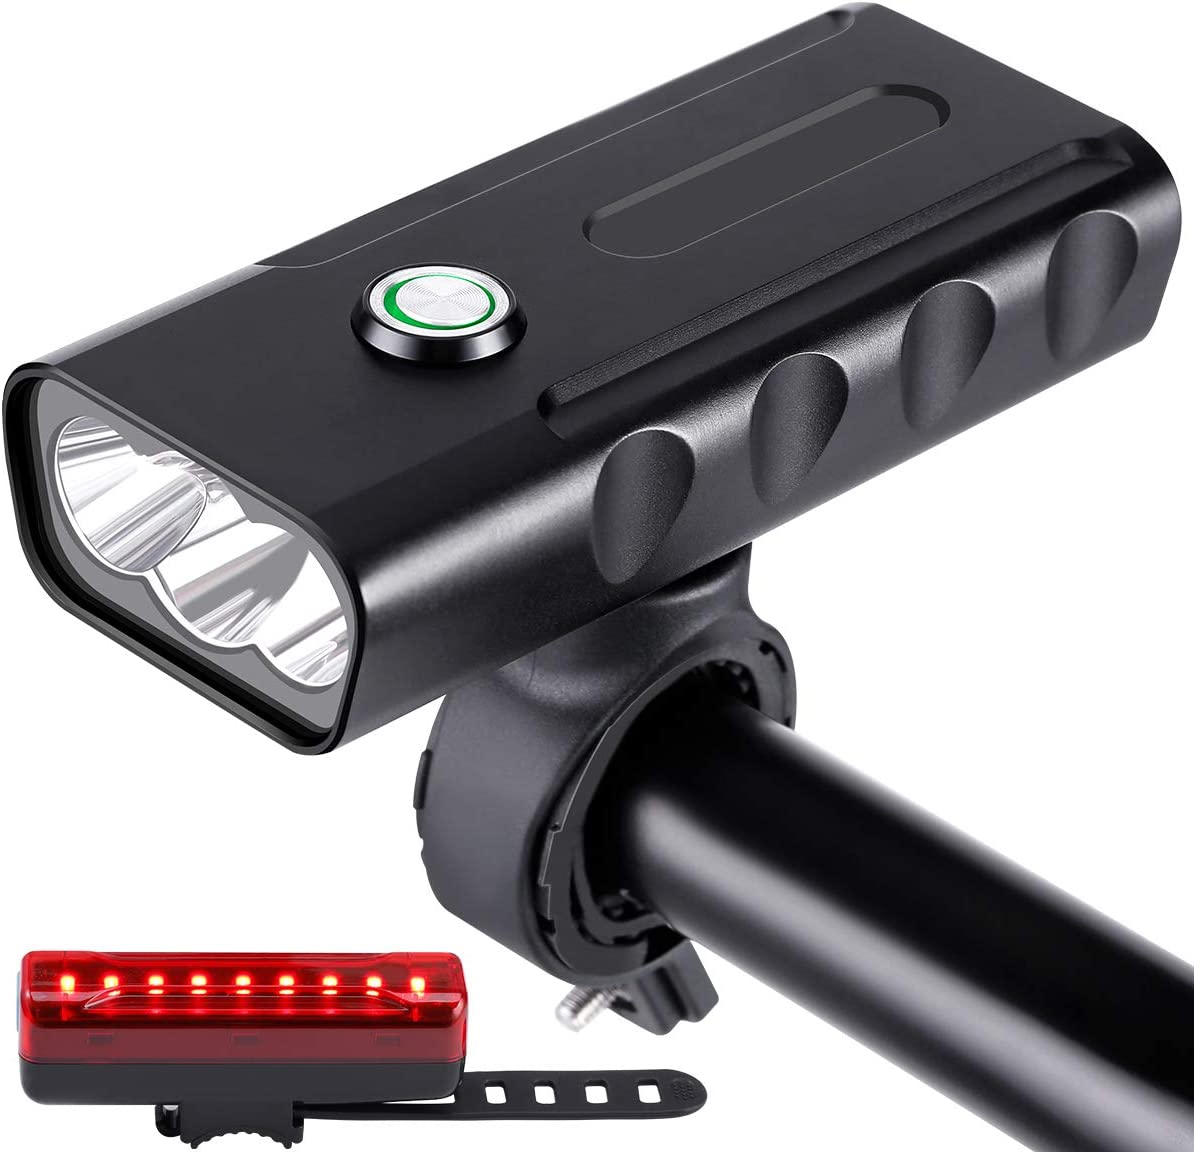 Limechoes 1200-Lumen USB-Rechargeable Front LED Bike Light $9.60 Coupon